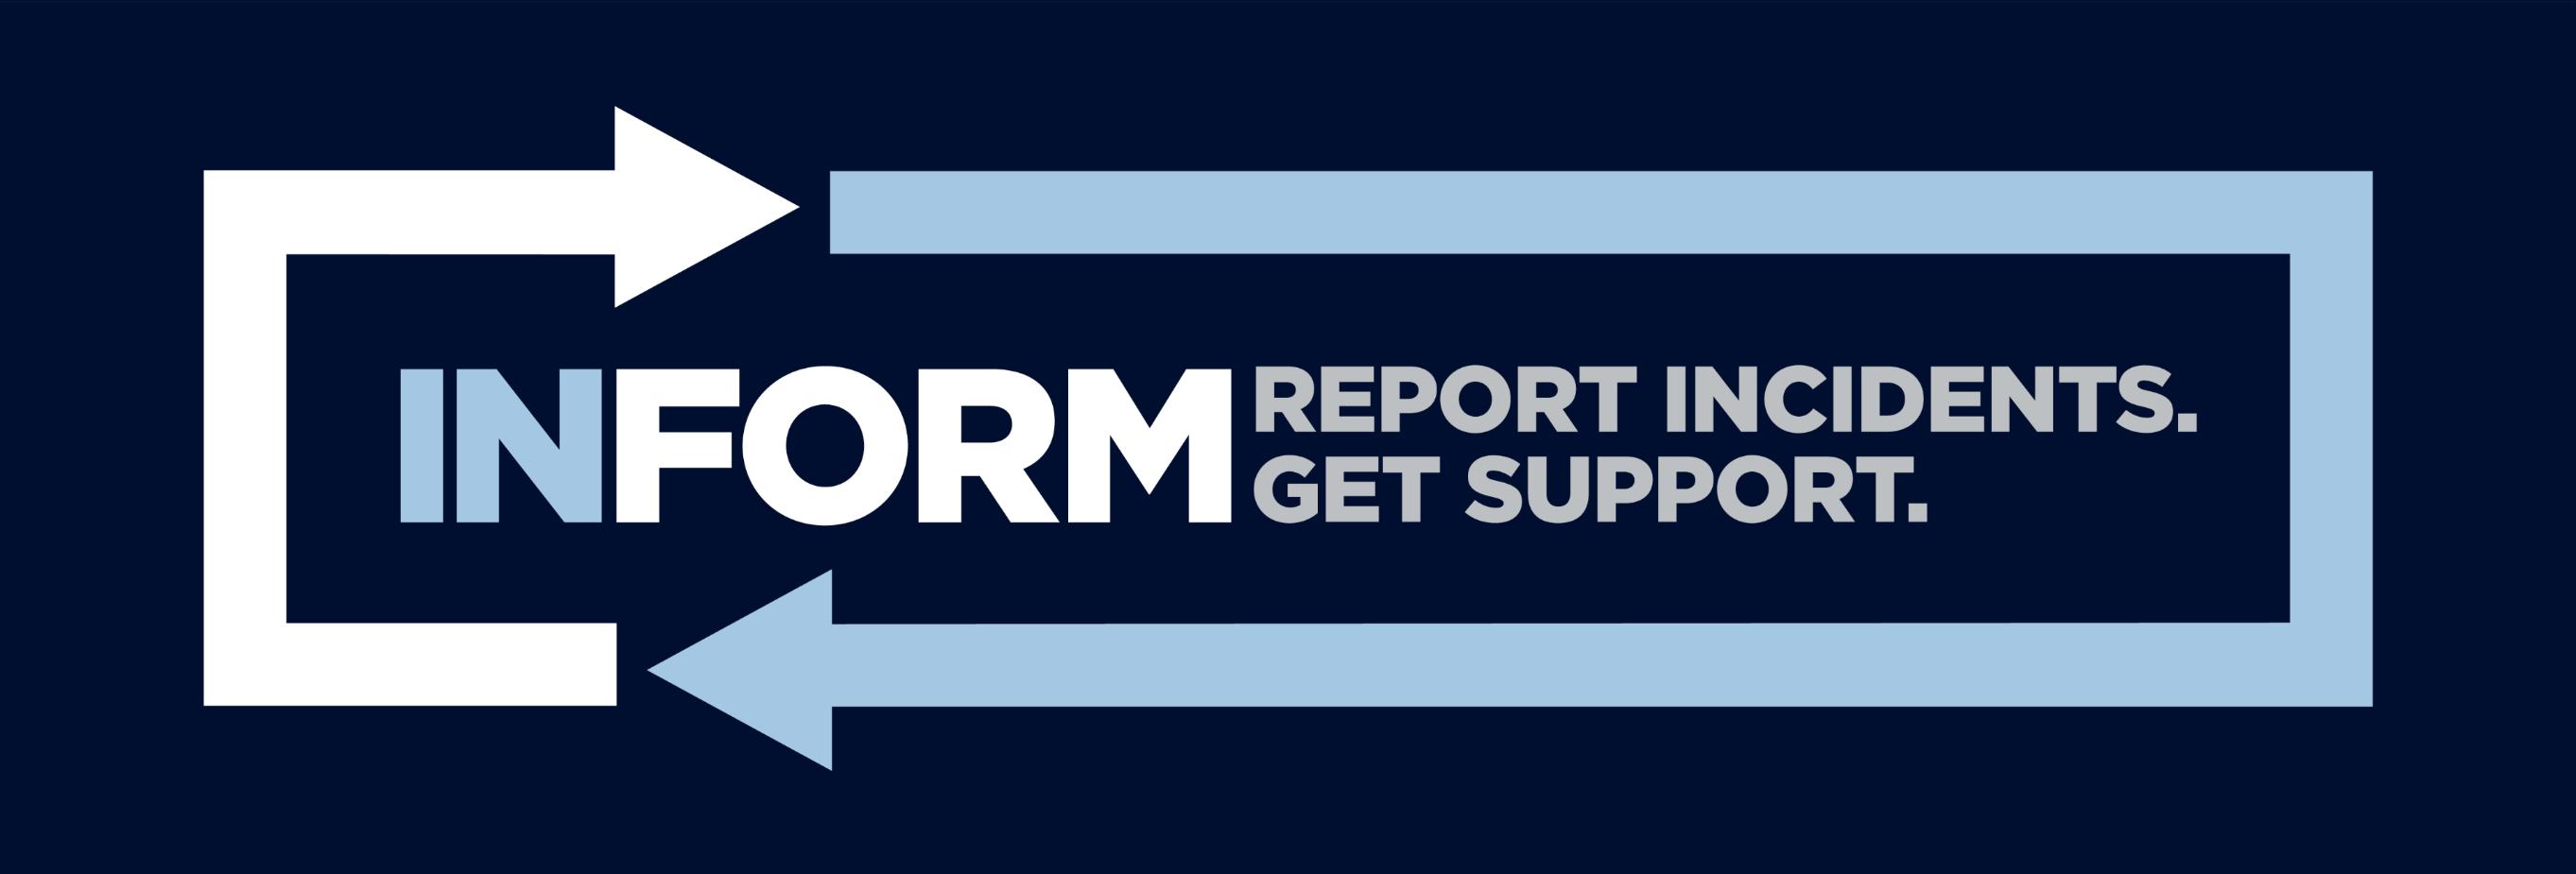 InForm. Report Incidents. Get Support.